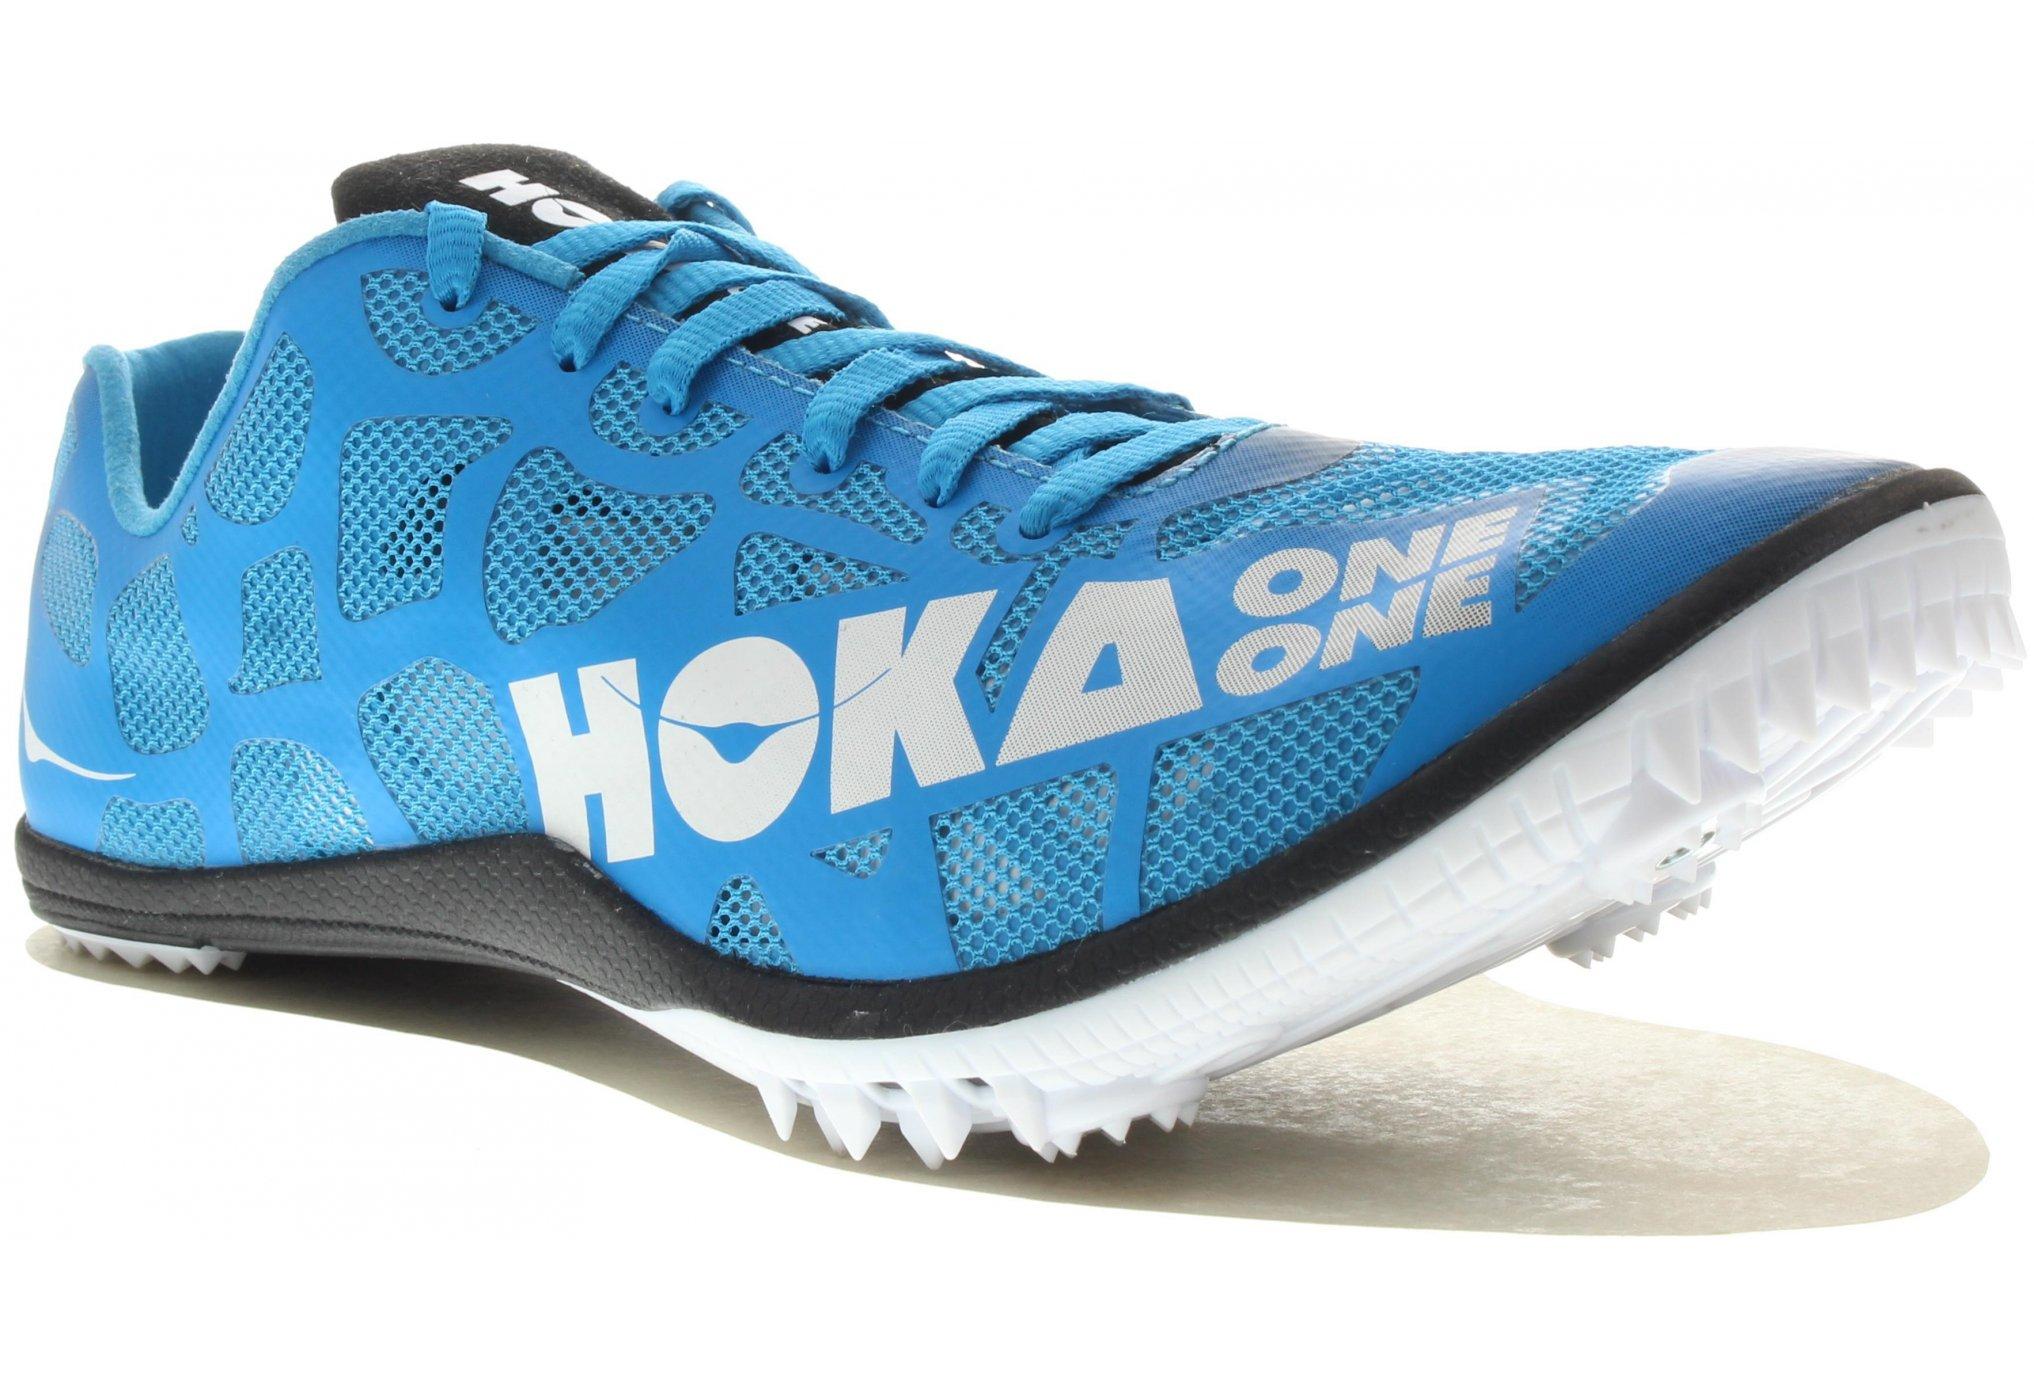 Hoka One One Rocket MD M Diététique Chaussures homme